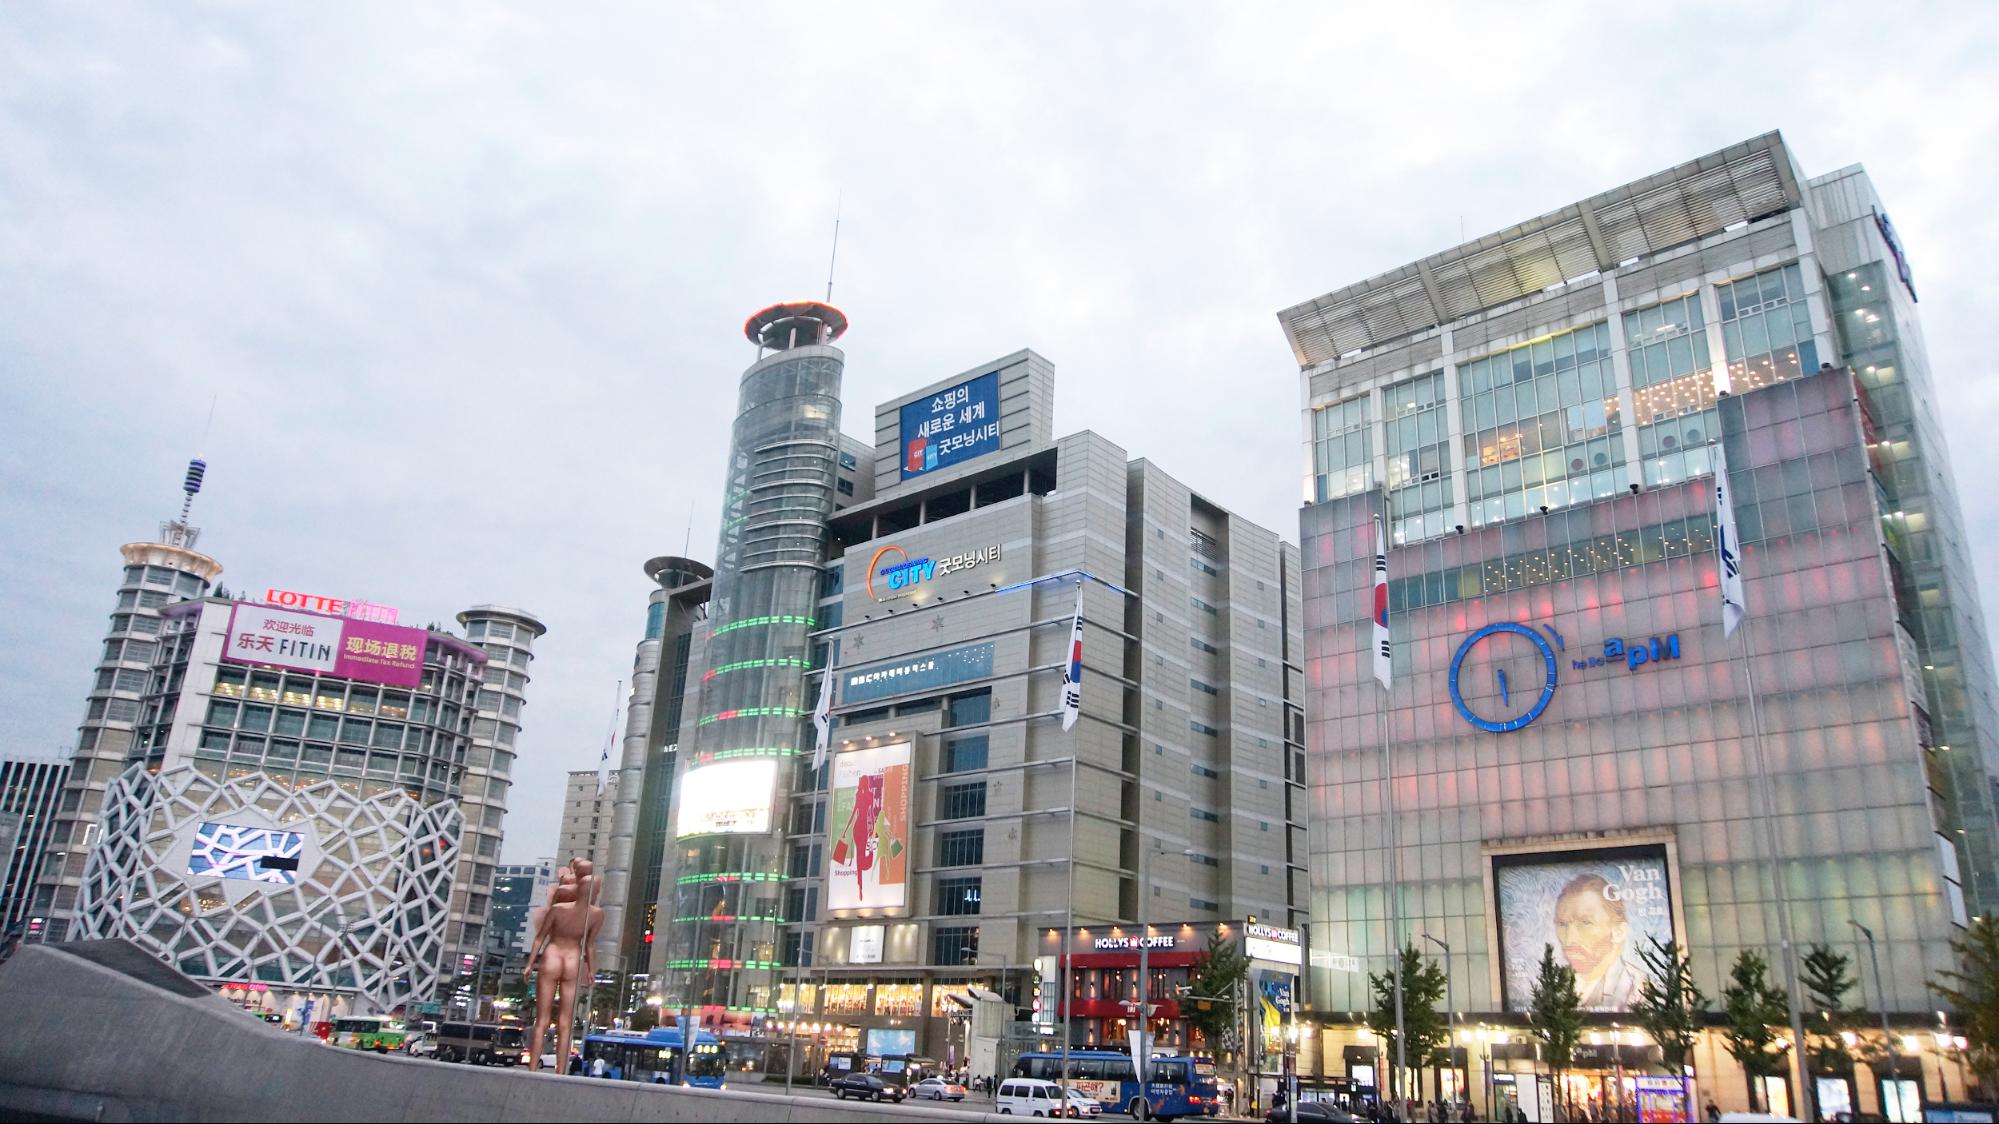 Itinerary Liburan Ke Korea Selatan Hemat Bersama Keluarga 5h4m Tiket Masuk Sky 100 Hongkong Anak Image Credit Jens Wanderstories